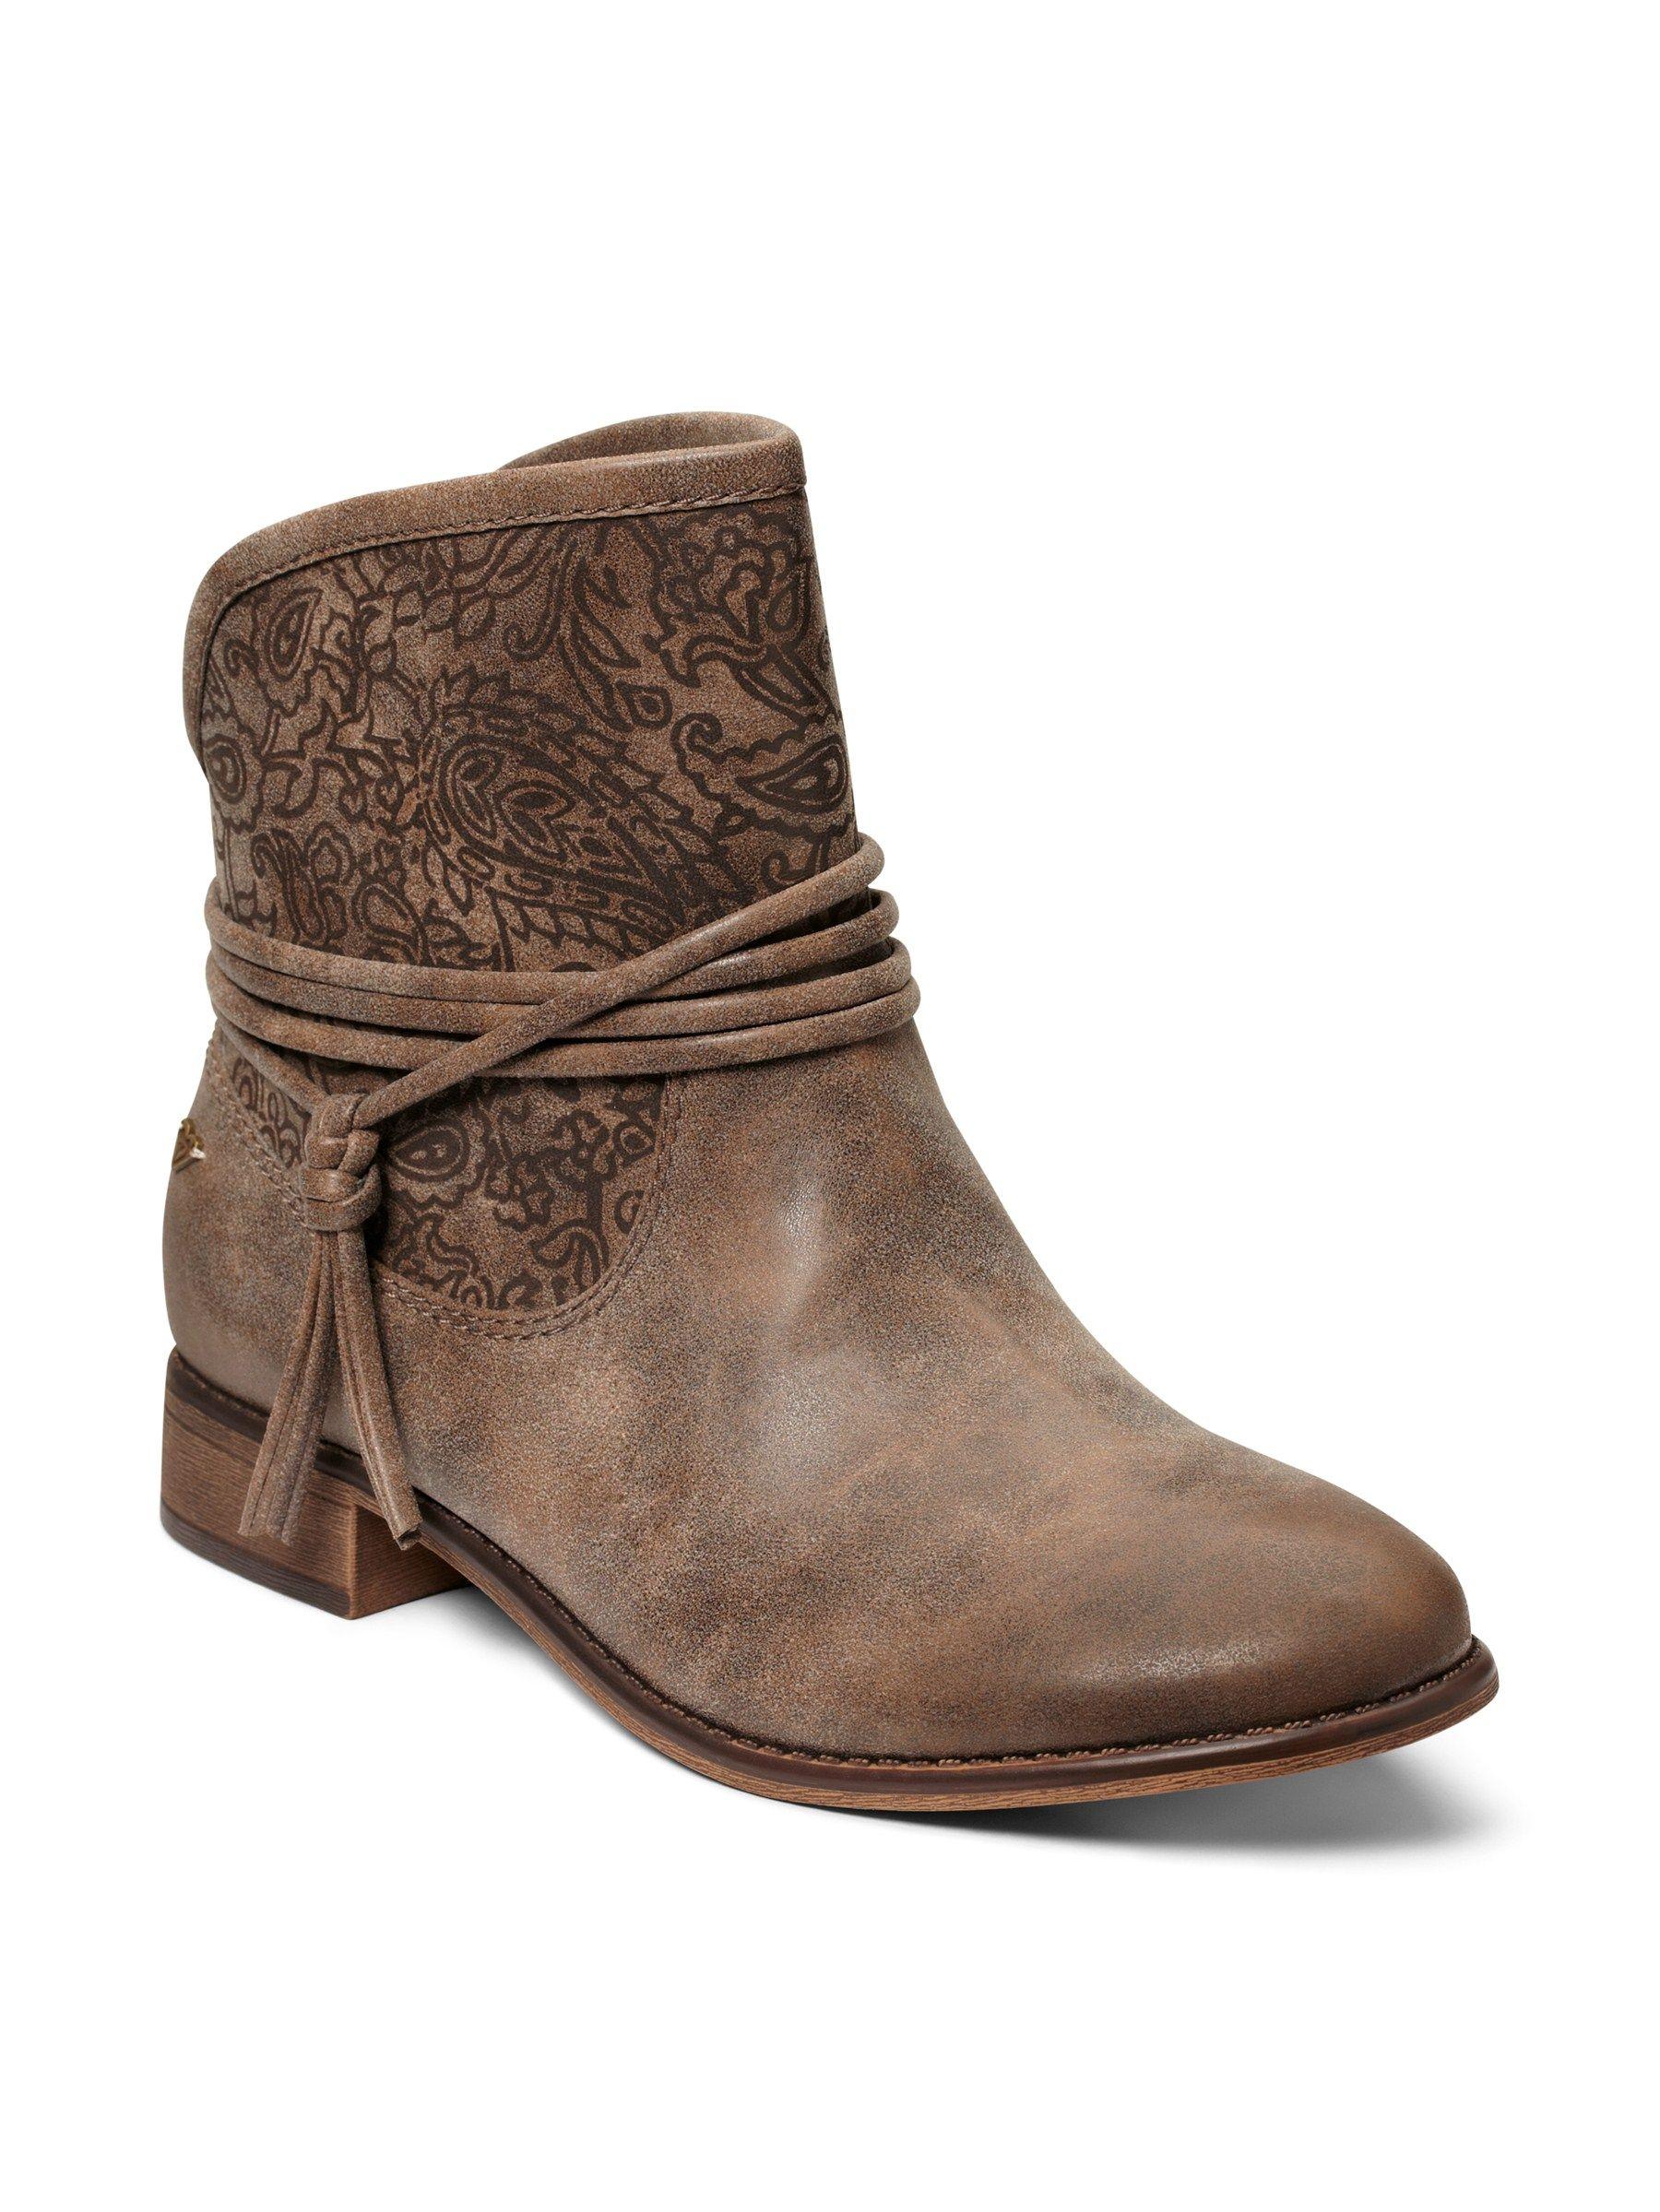 9362b1fcd92 Carrington Boots - Roxy | Fashionista | Boots, Roxy boots, Slipper boots